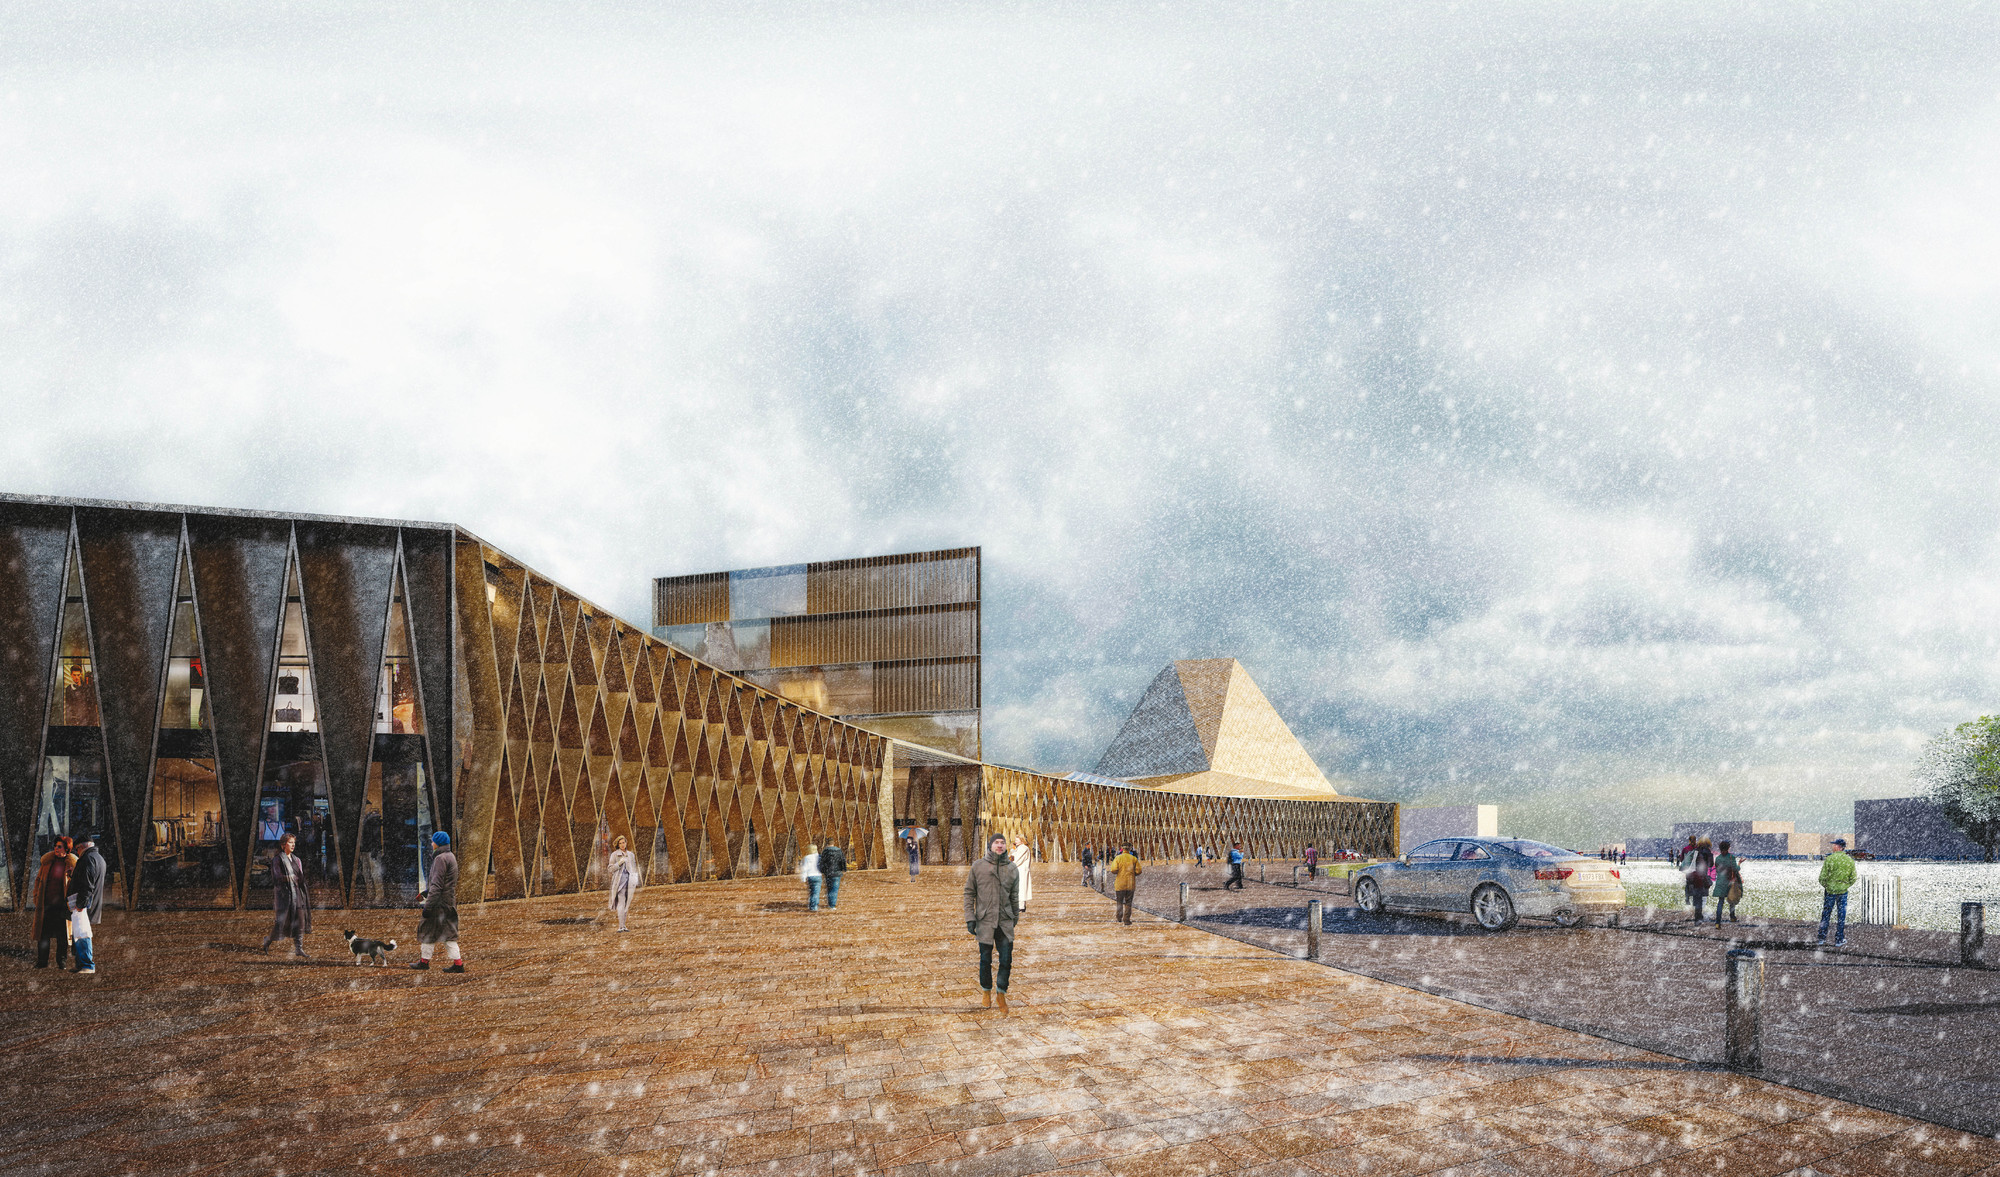 Edificios. Image Cortesia de Rubio Arquitectura